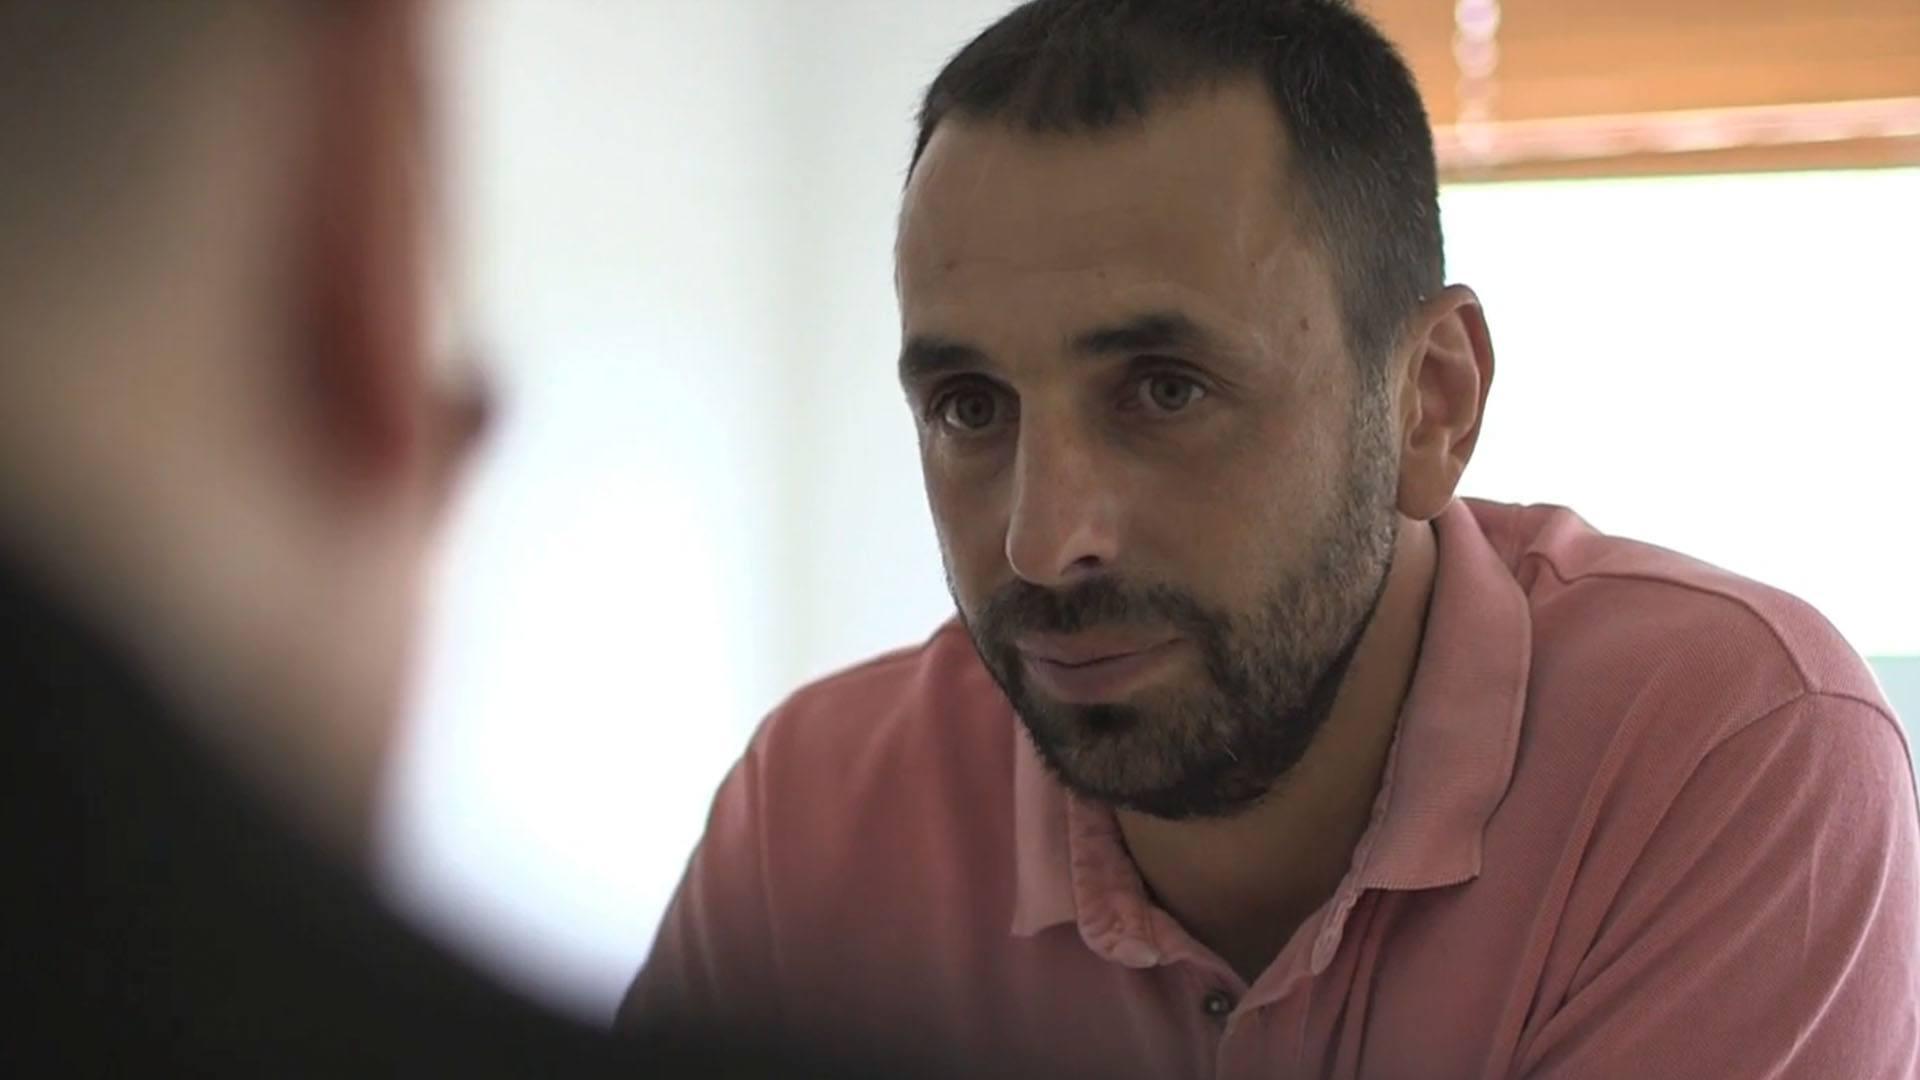 Interview with Salvador Gutiérrez, CFO at mjn-neuro